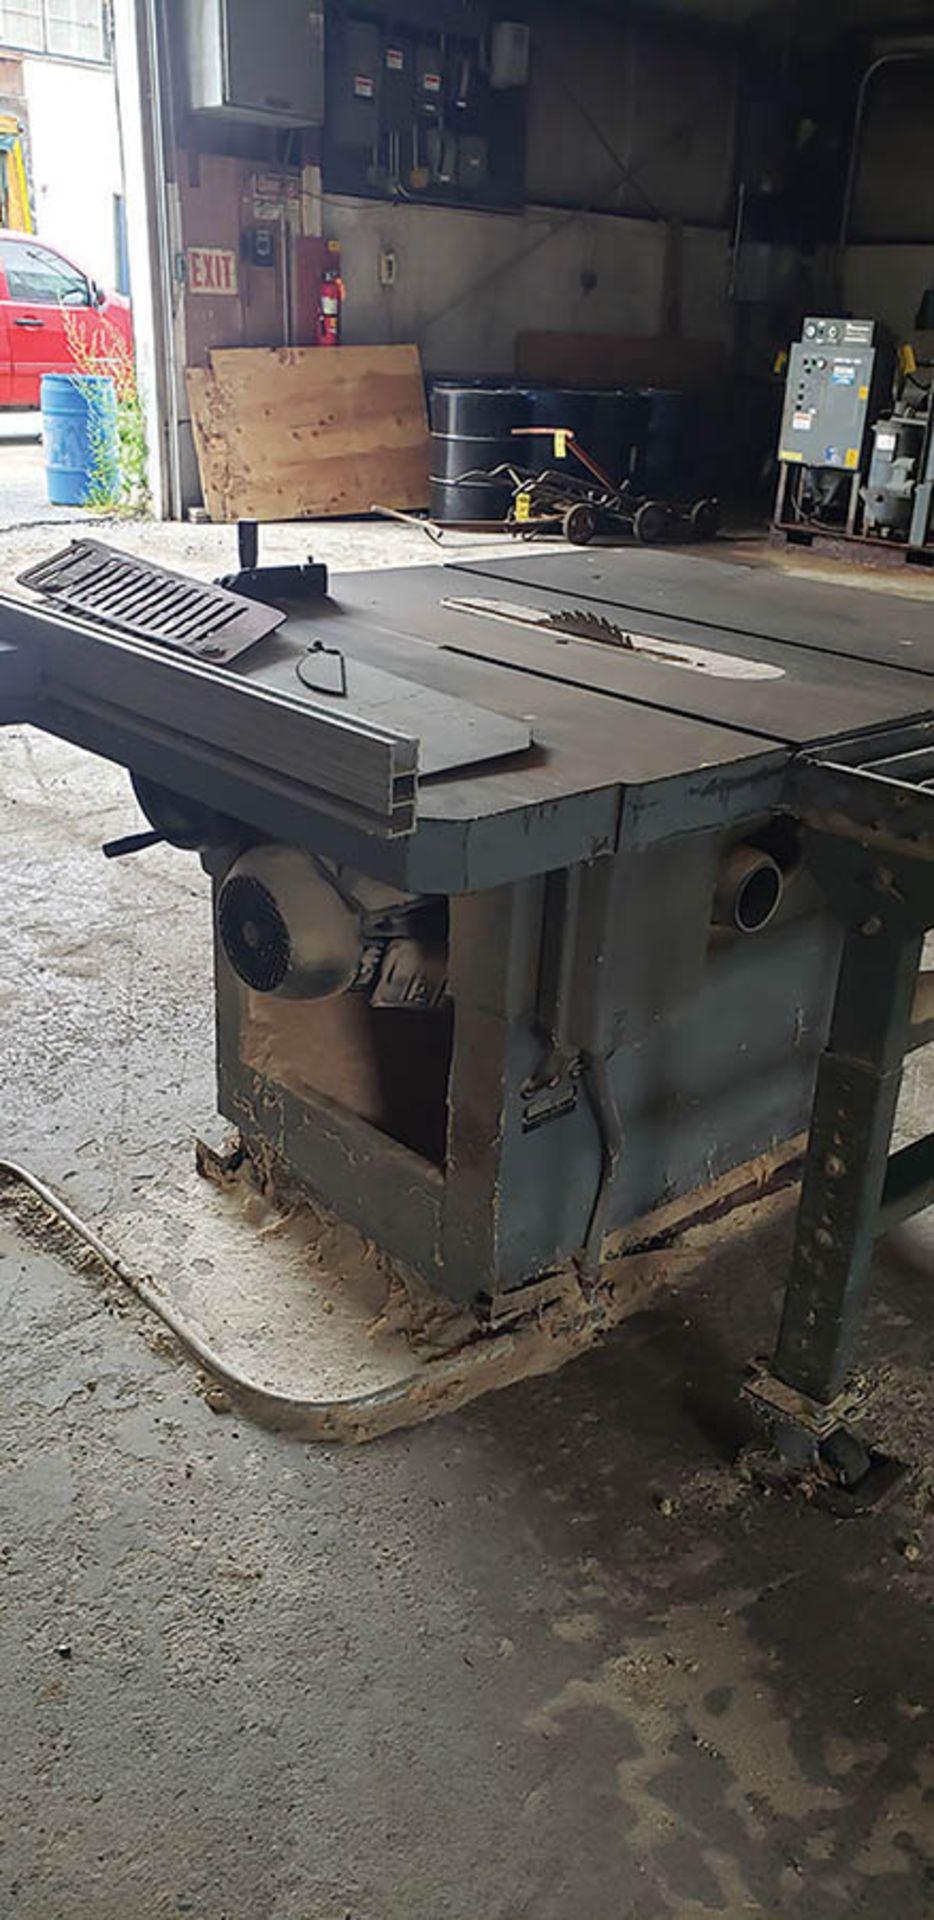 Lot 250 - DELTA RT40 TABLE SAW, 59 1/4'' X 43 1/4'' TABLE, S/N 4035, 2' X 6' CONVEYOR